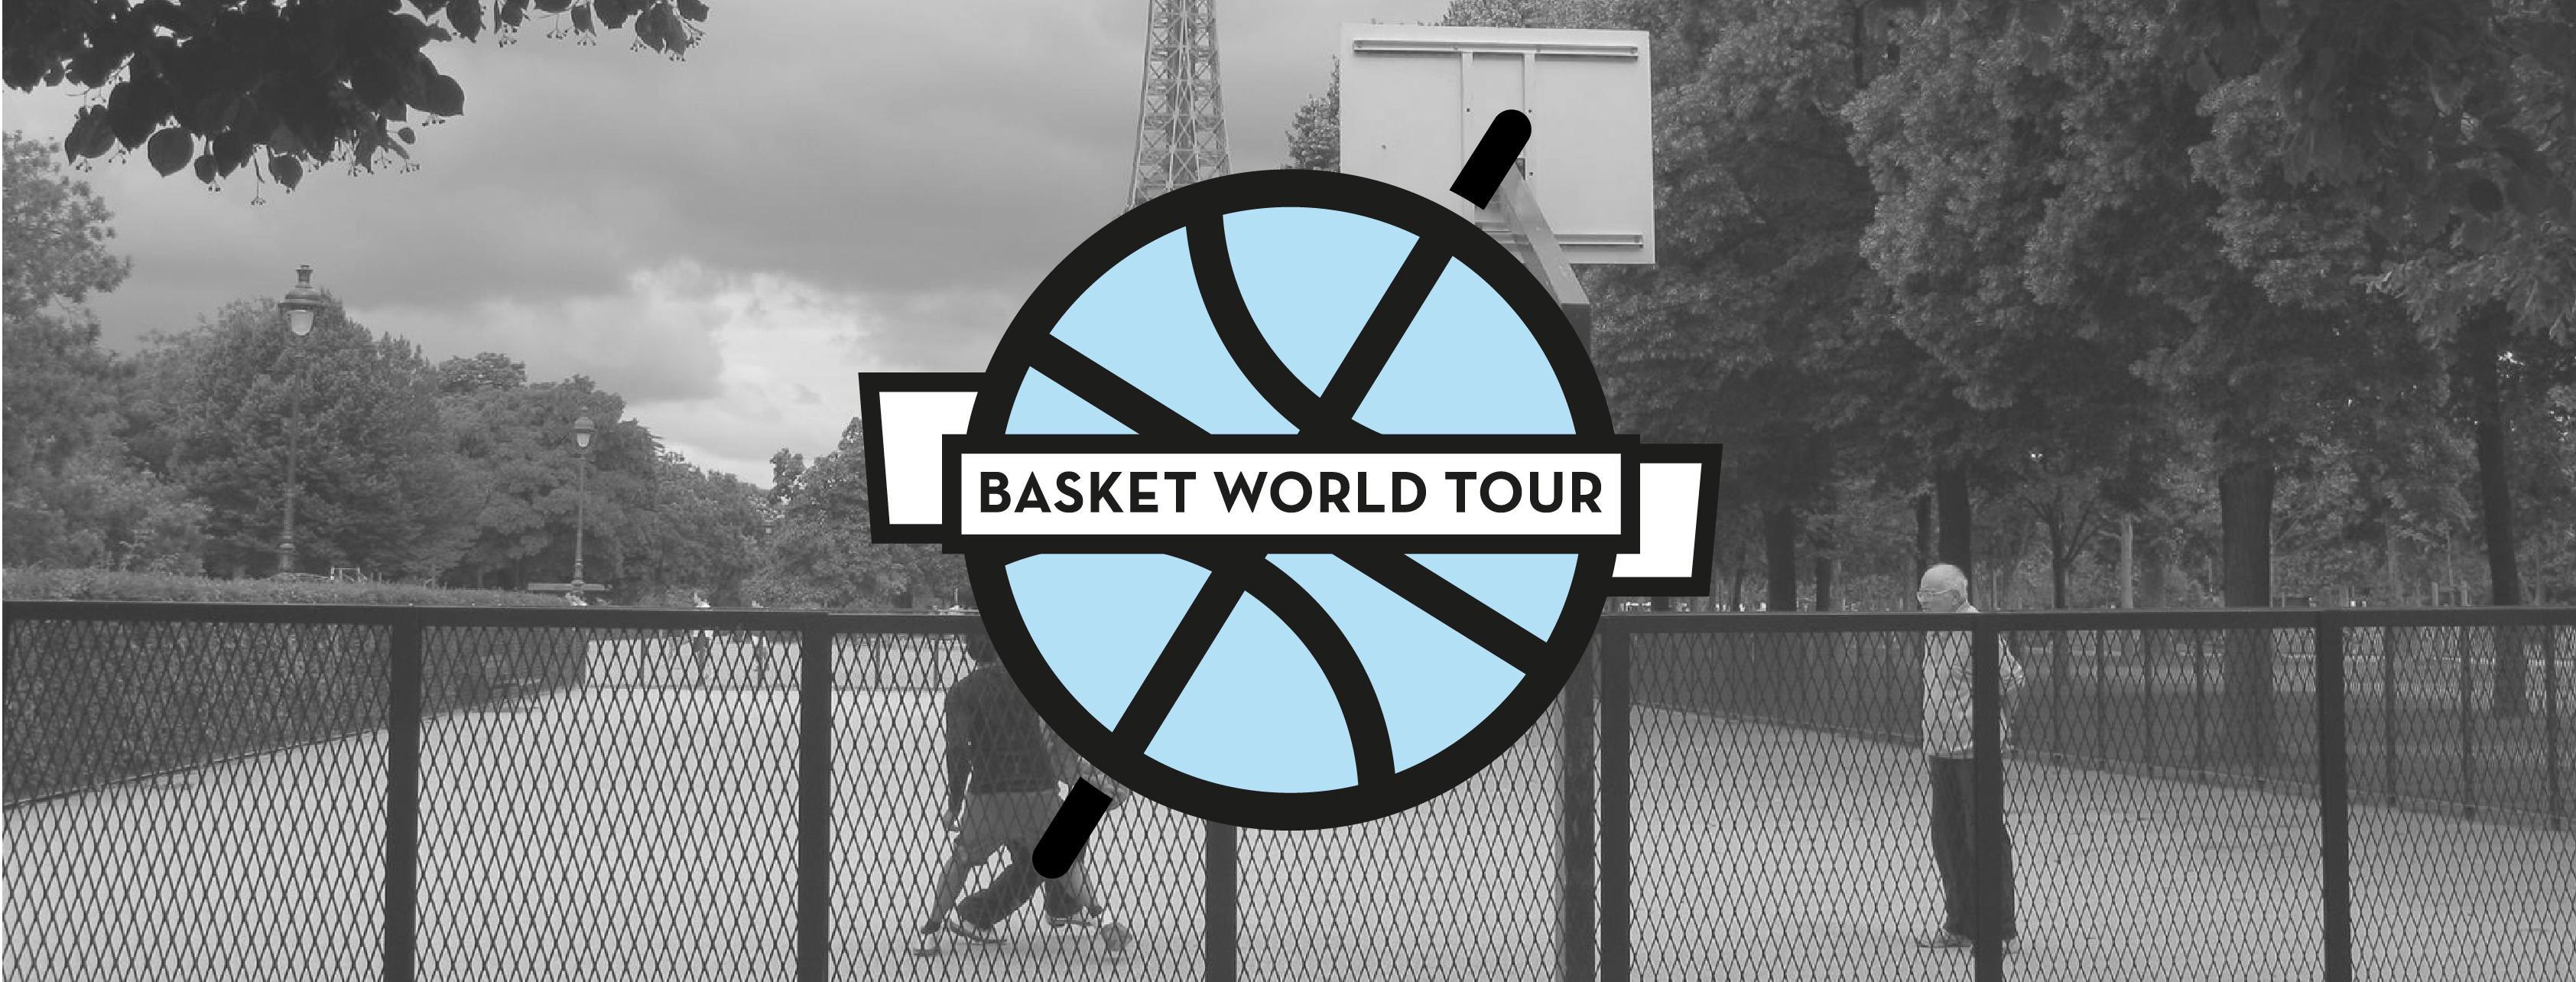 Basket World Tour